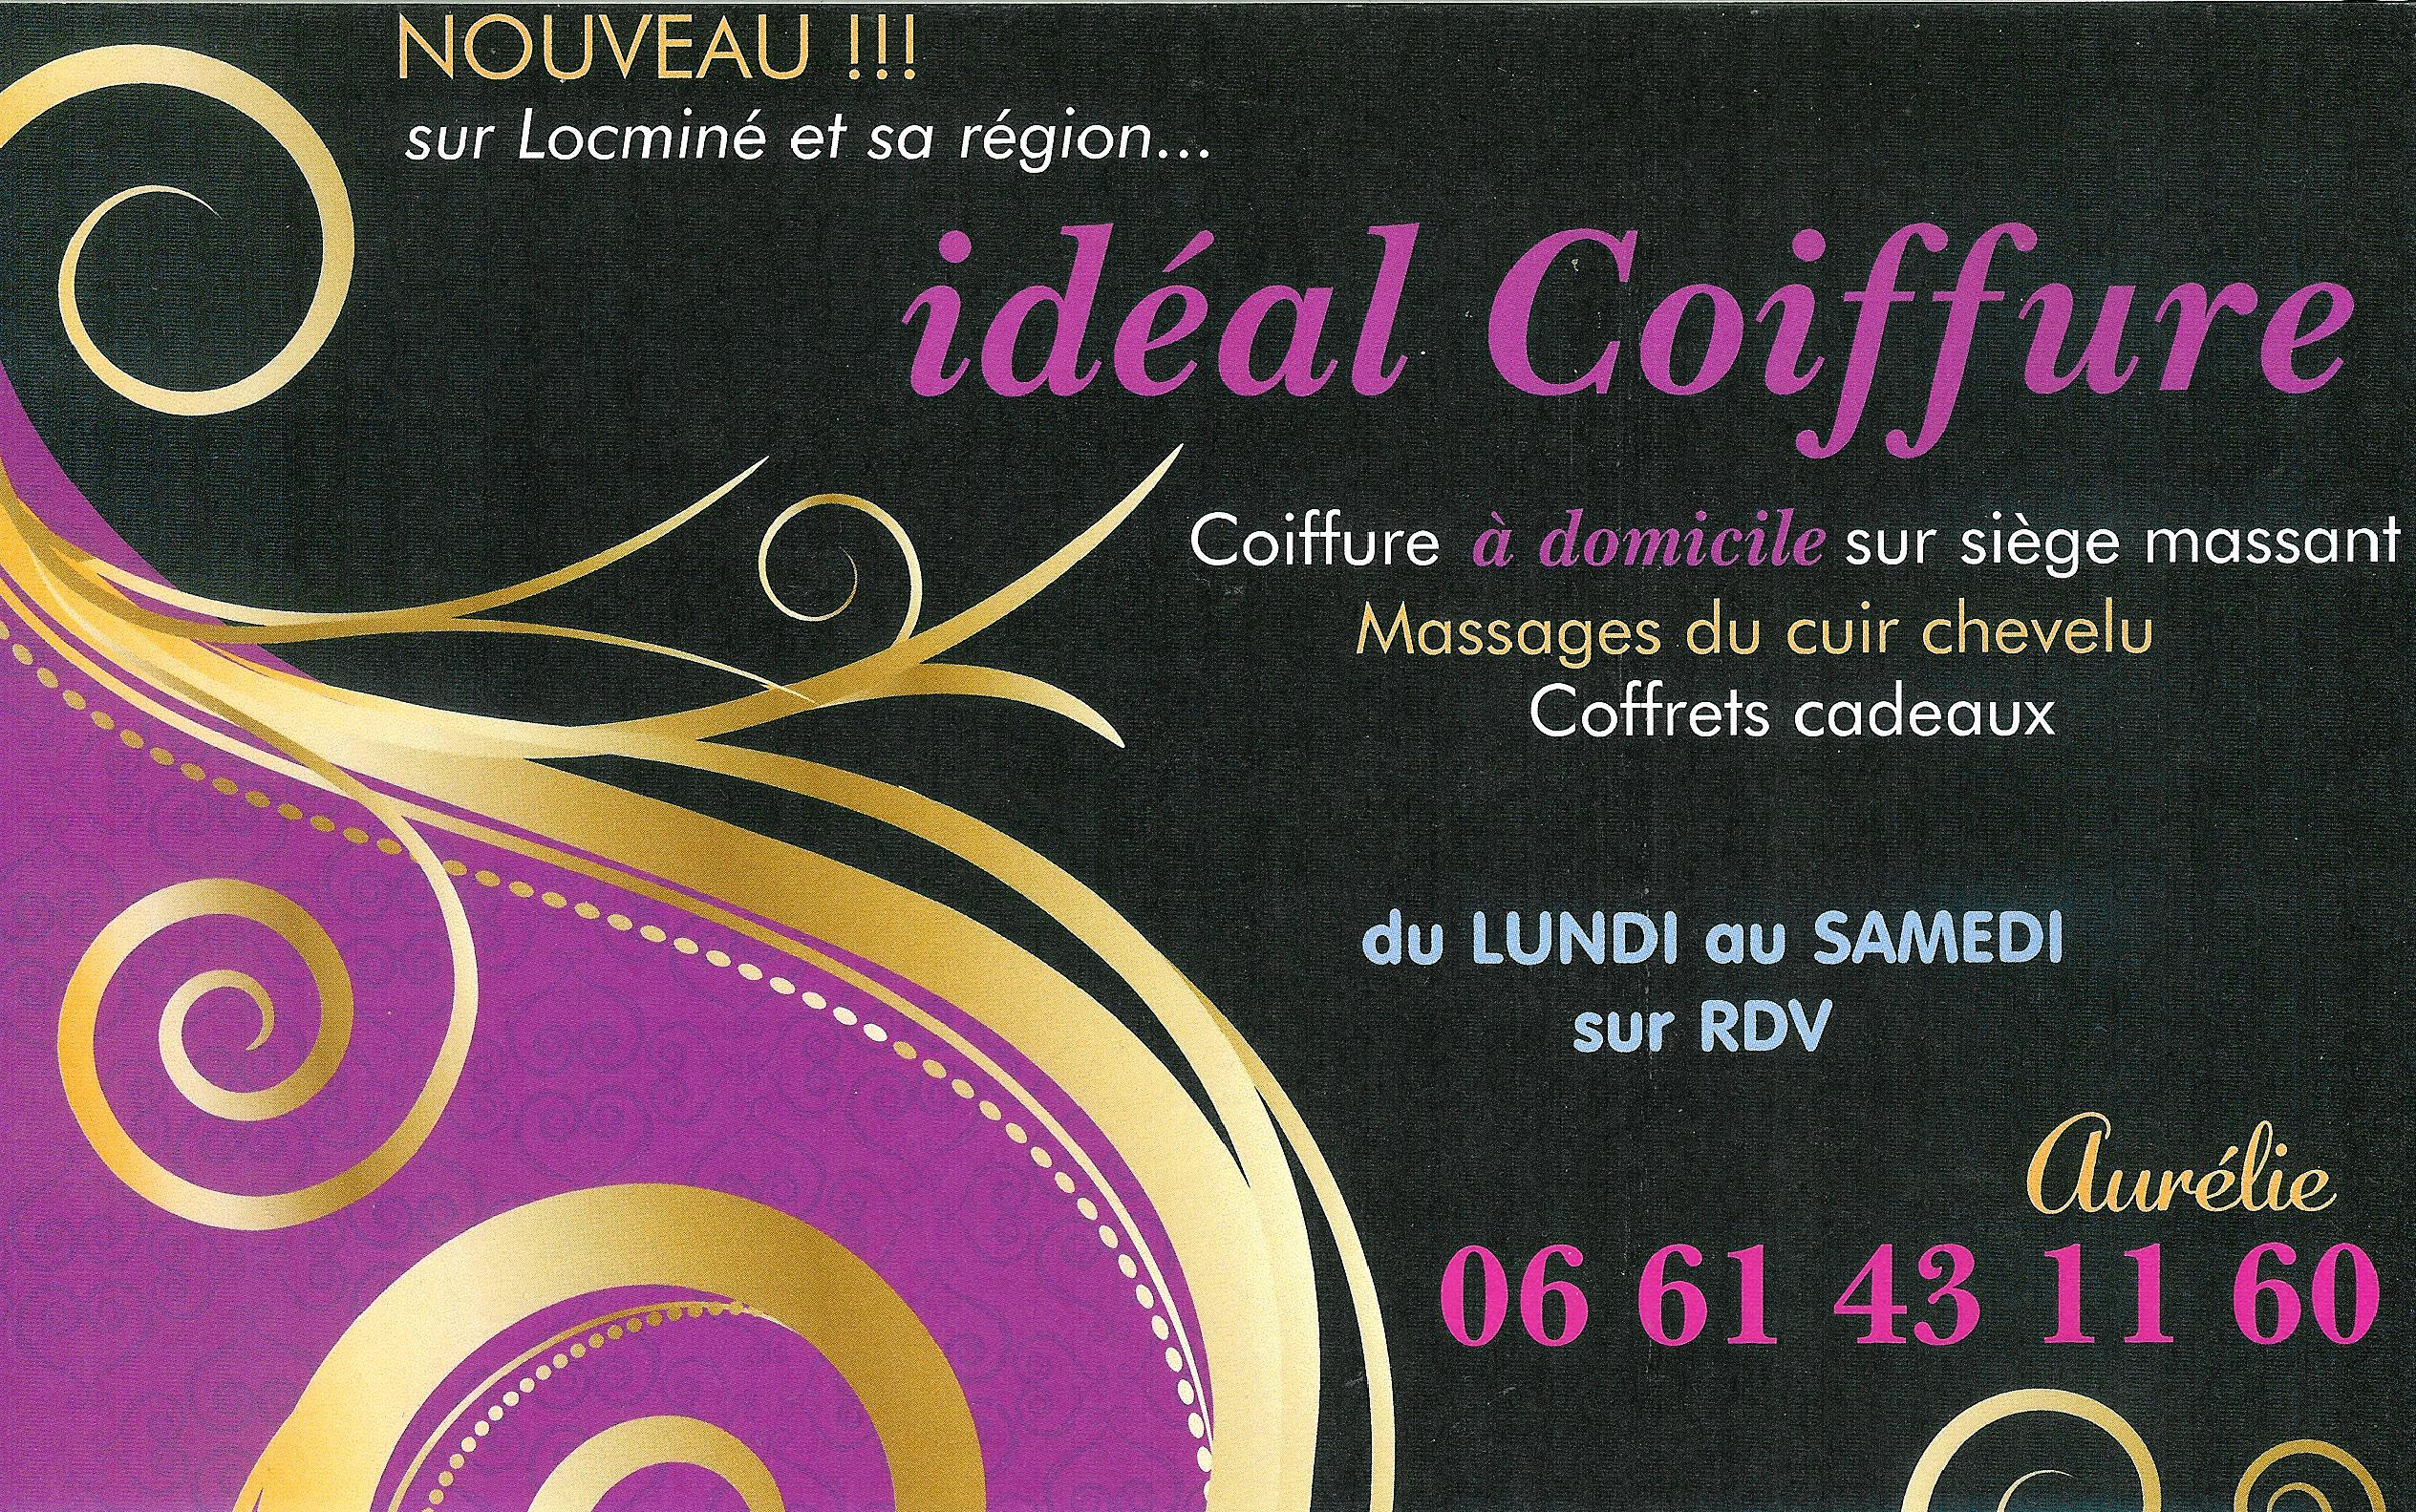 Bien connu bandeau-ideal-coiffure-flyer.jpg - Ideal Coiffure à Domicile ZO64